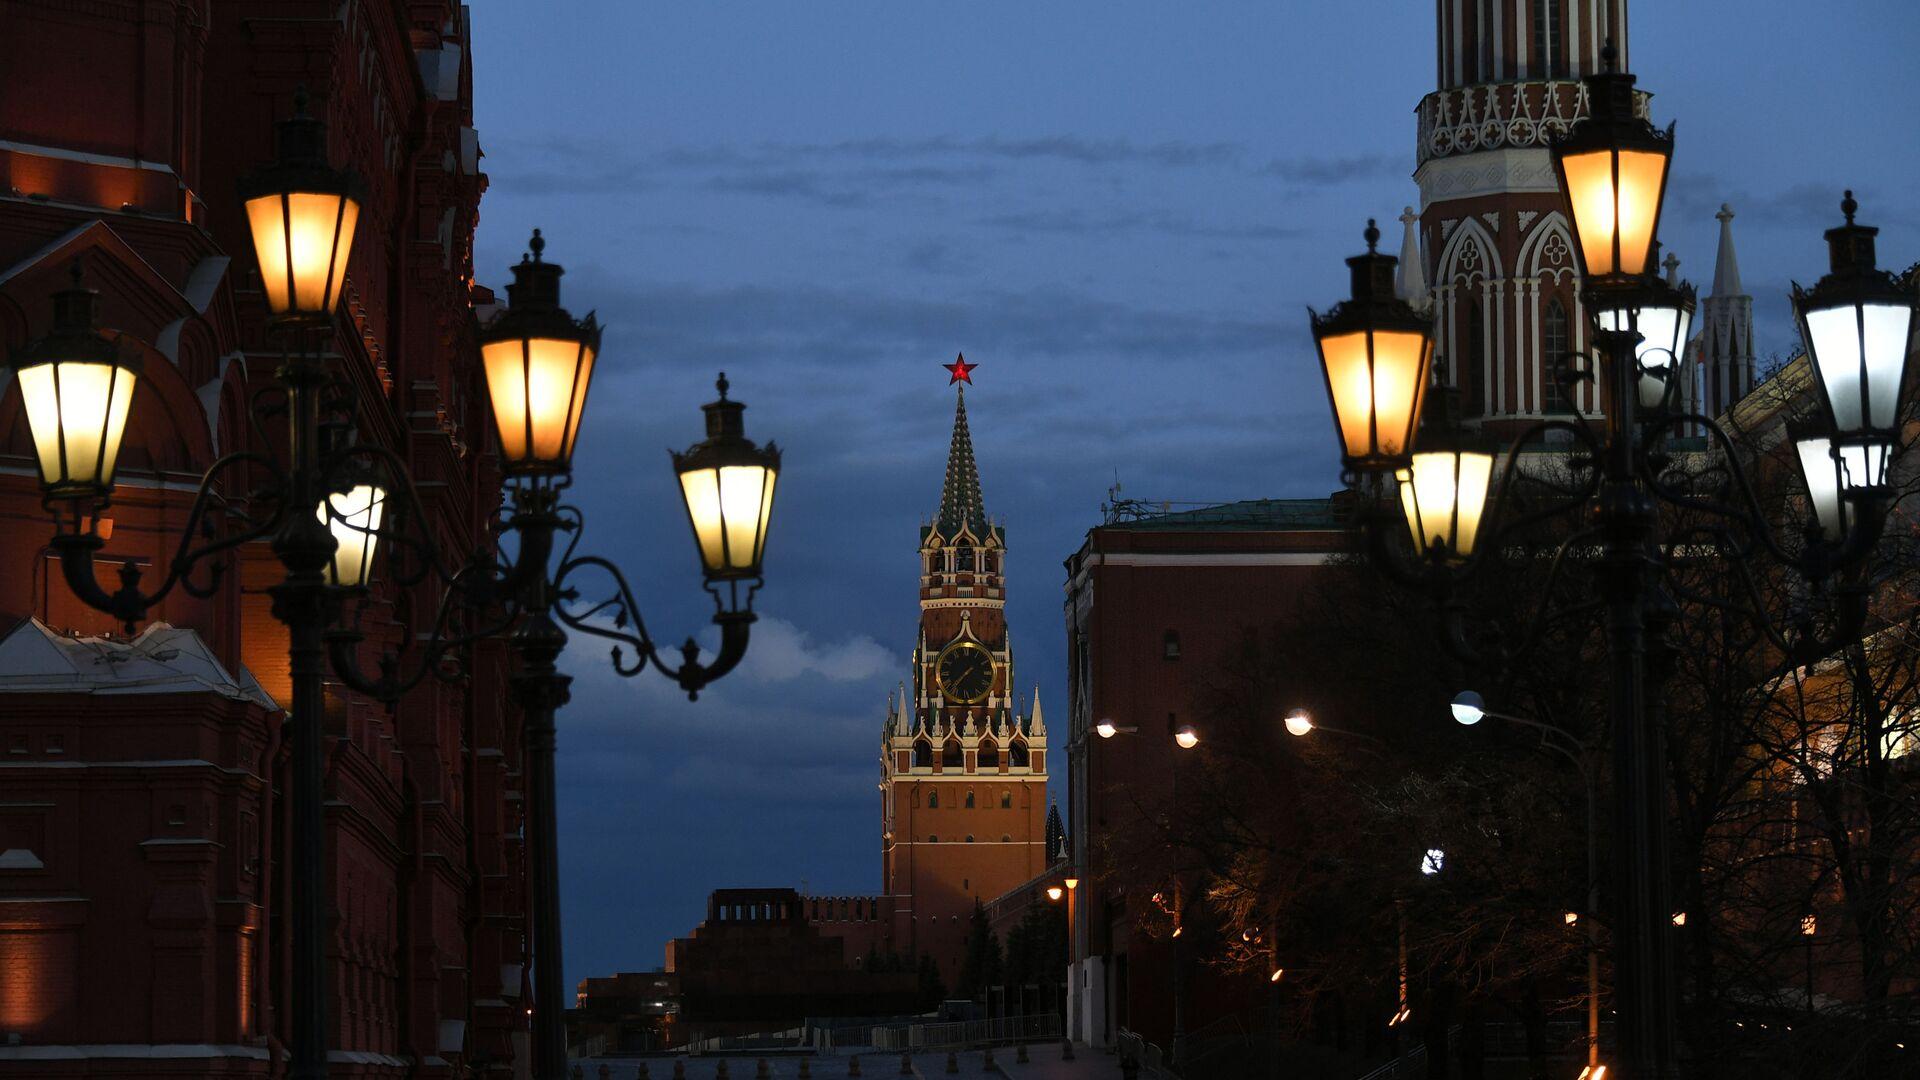 La Plaza Roja y el Kremlin de Moscú - Sputnik Mundo, 1920, 13.10.2021